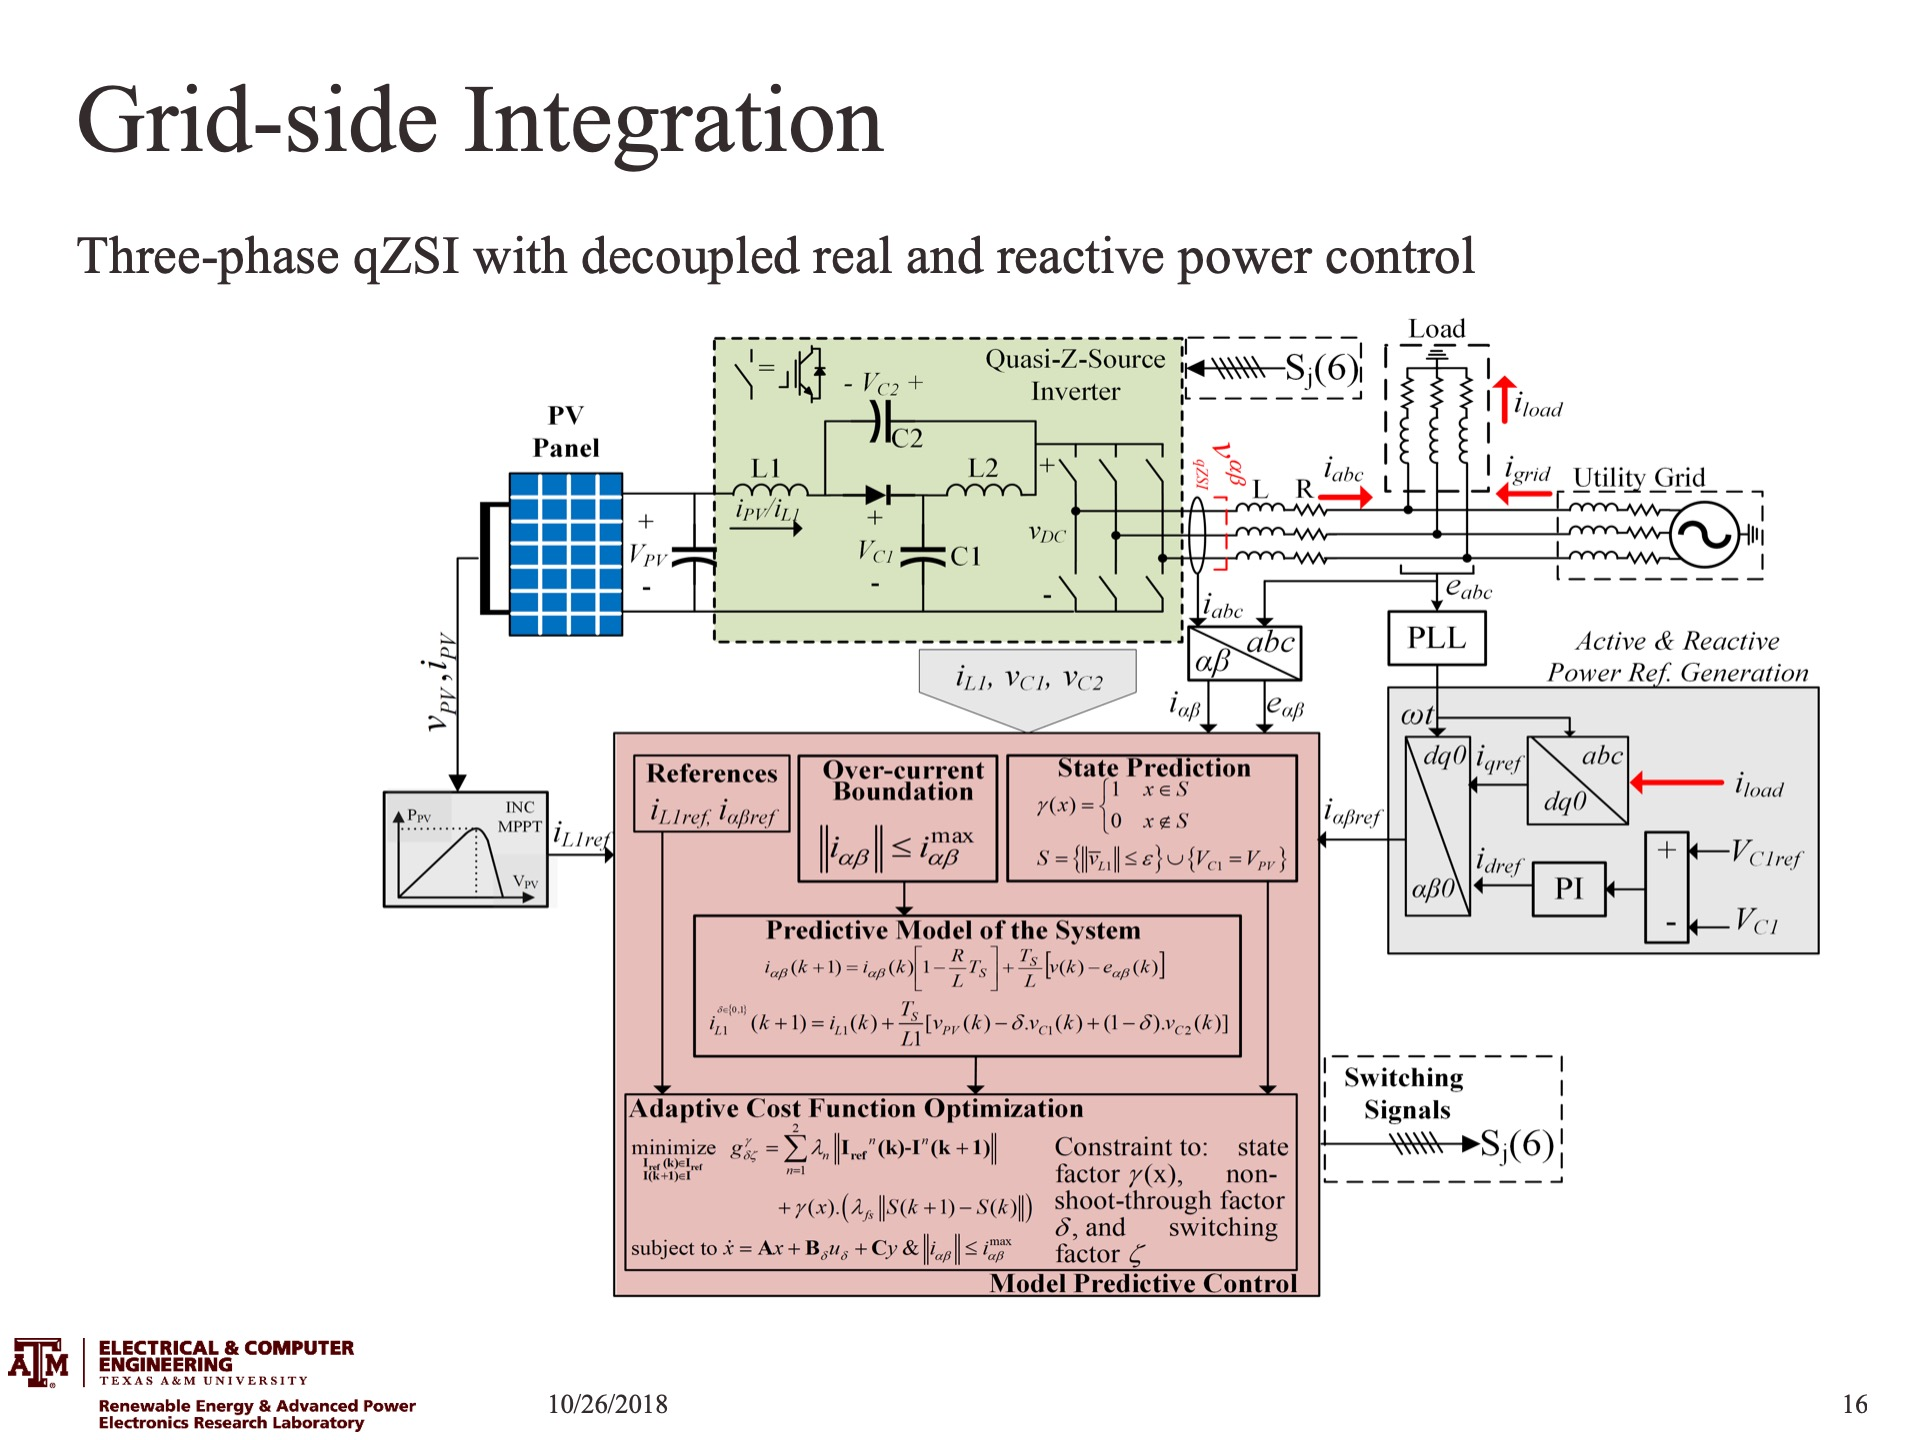 SmartPVSkin Slide 16